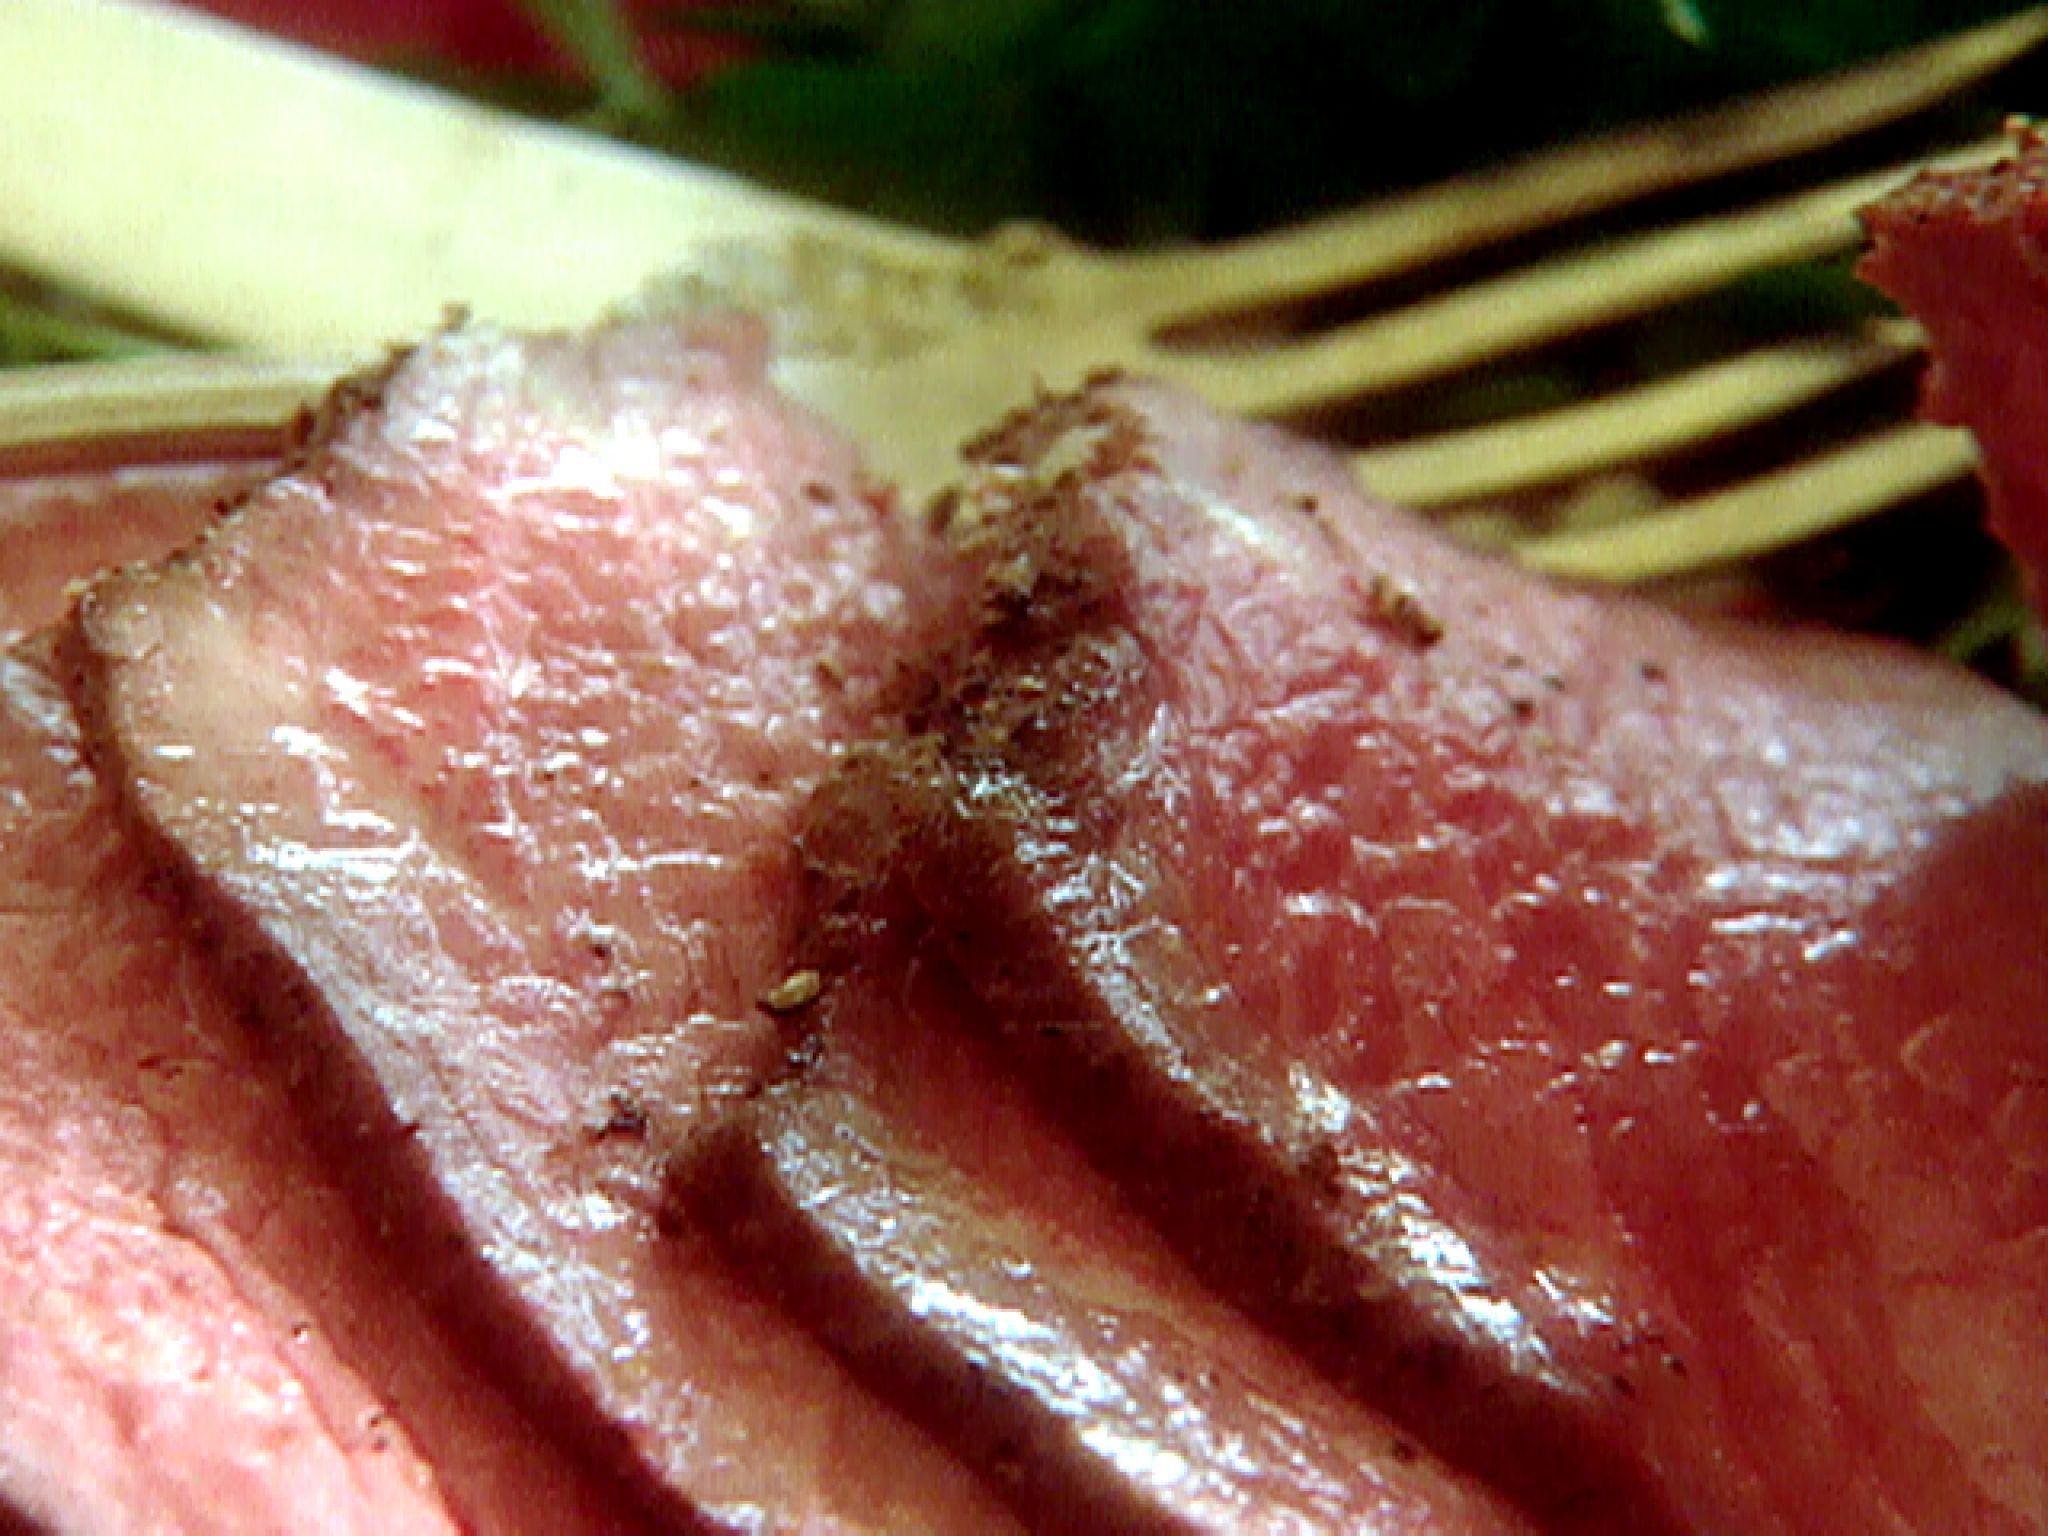 Party eye of round steak recipe round steak paula deen and steak party eye of round steak forumfinder Image collections